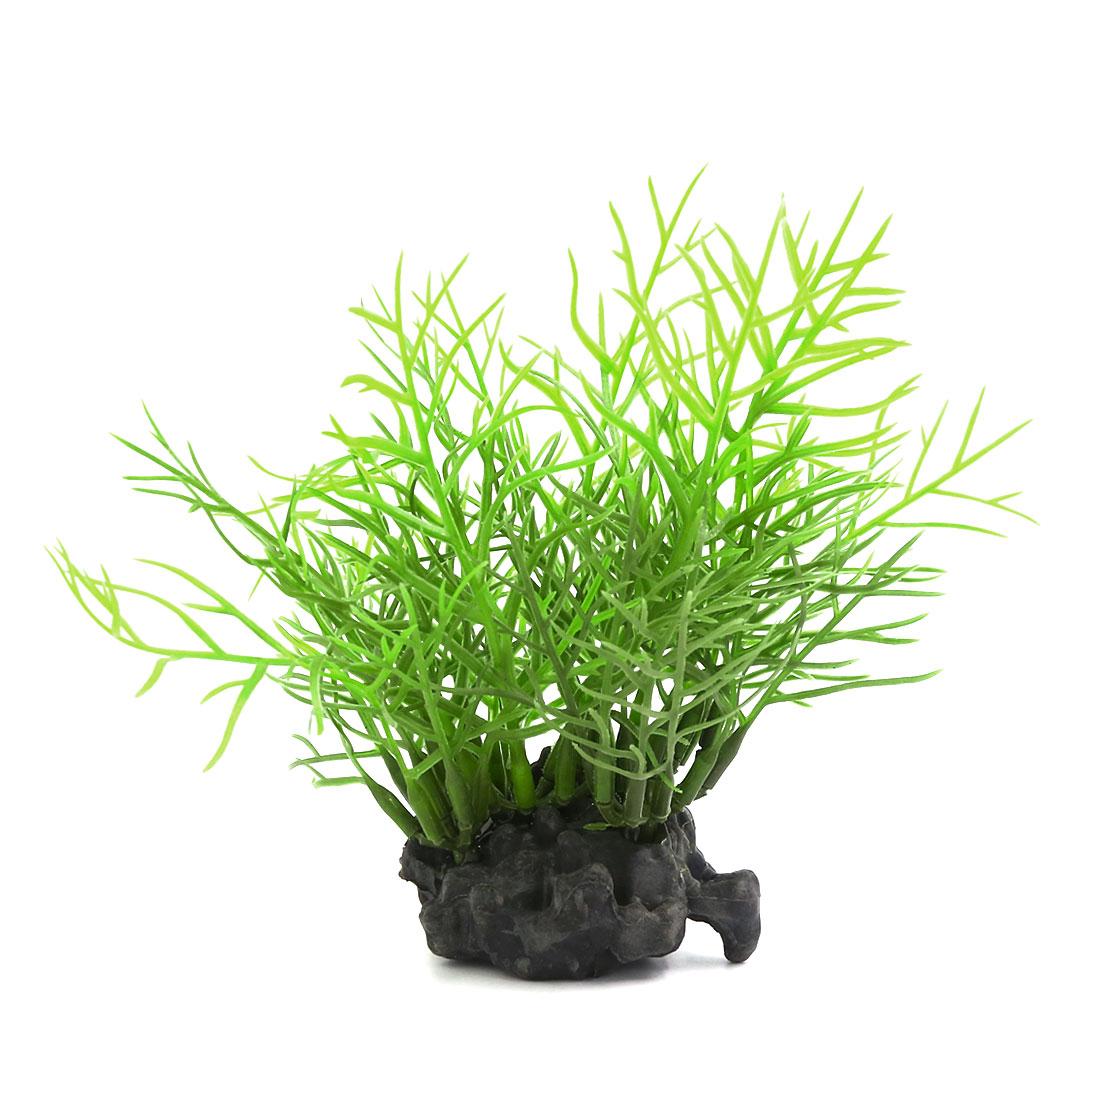 Small Fish Tank Artificial Green Plants Ornament 10x3x11cm